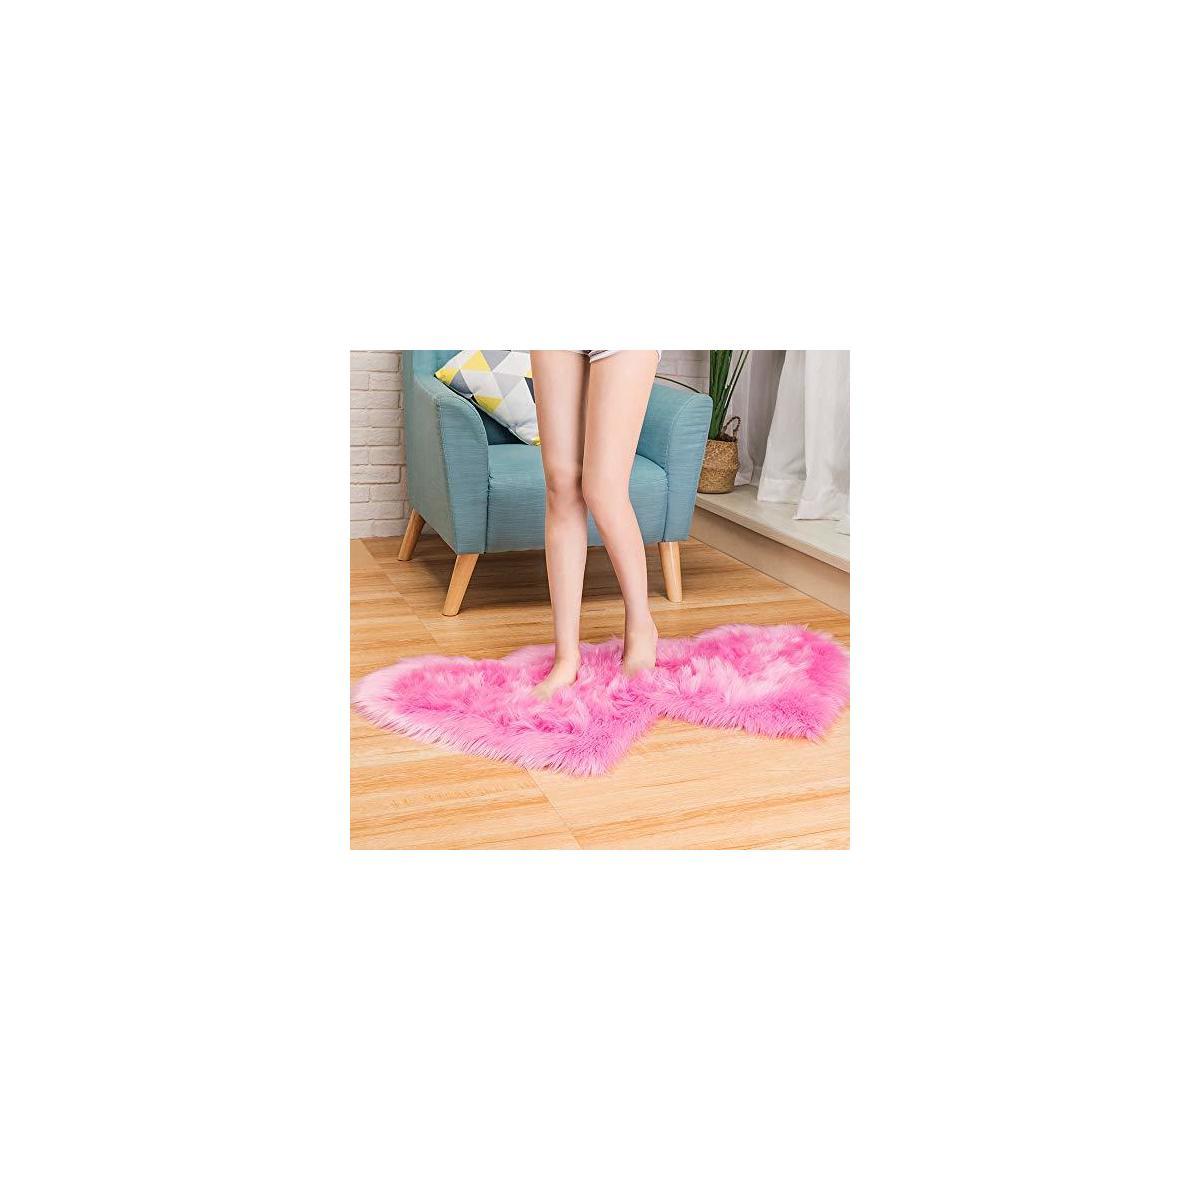 Heart Shape Area Rug Soft Fluffy Rugs Bedside Fur Rugs for Bedroom, Fluffy Kids Carpet Shaggy Floor Sofa Living Room, 2x4 Feet, AILISI